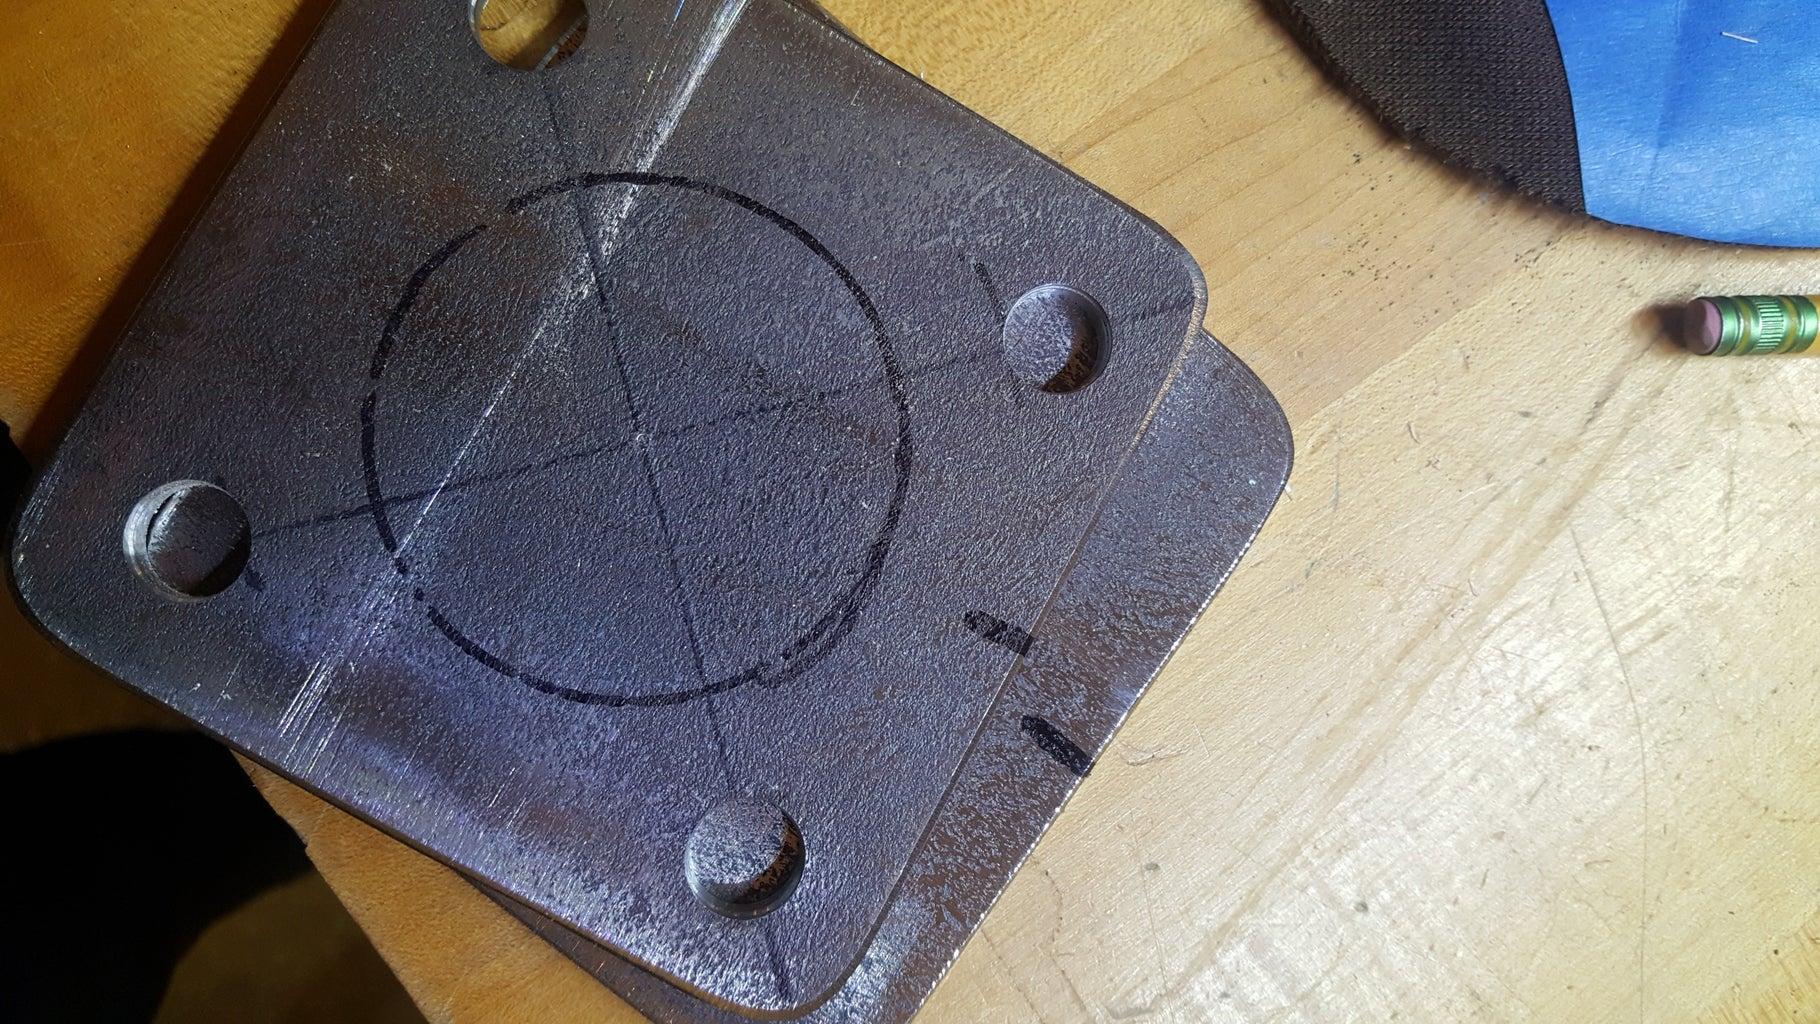 Transferring Holes